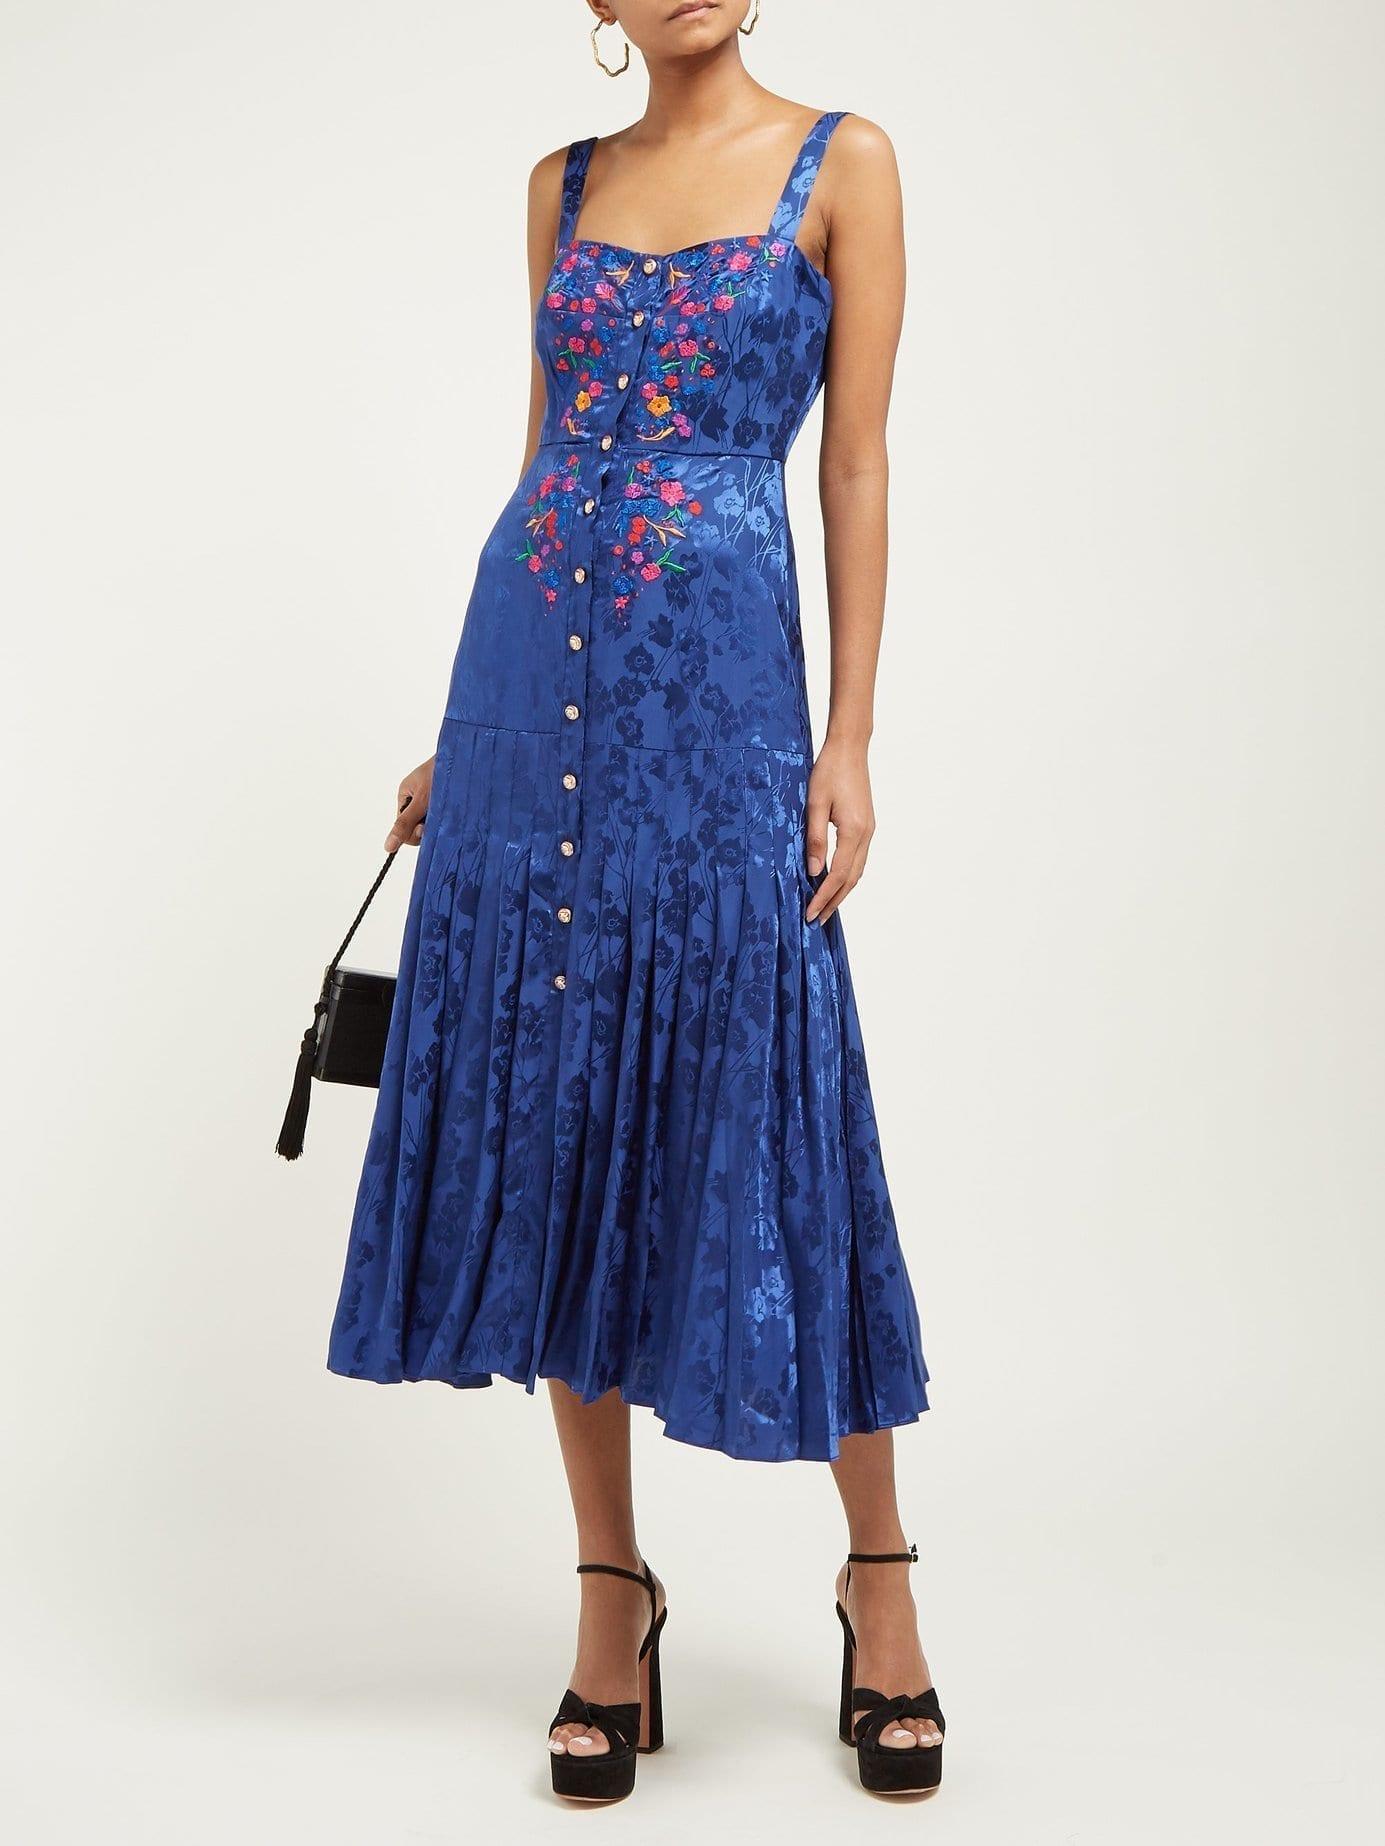 SALONI Karen Floral-Jacquard Silk Midi Blue Dress